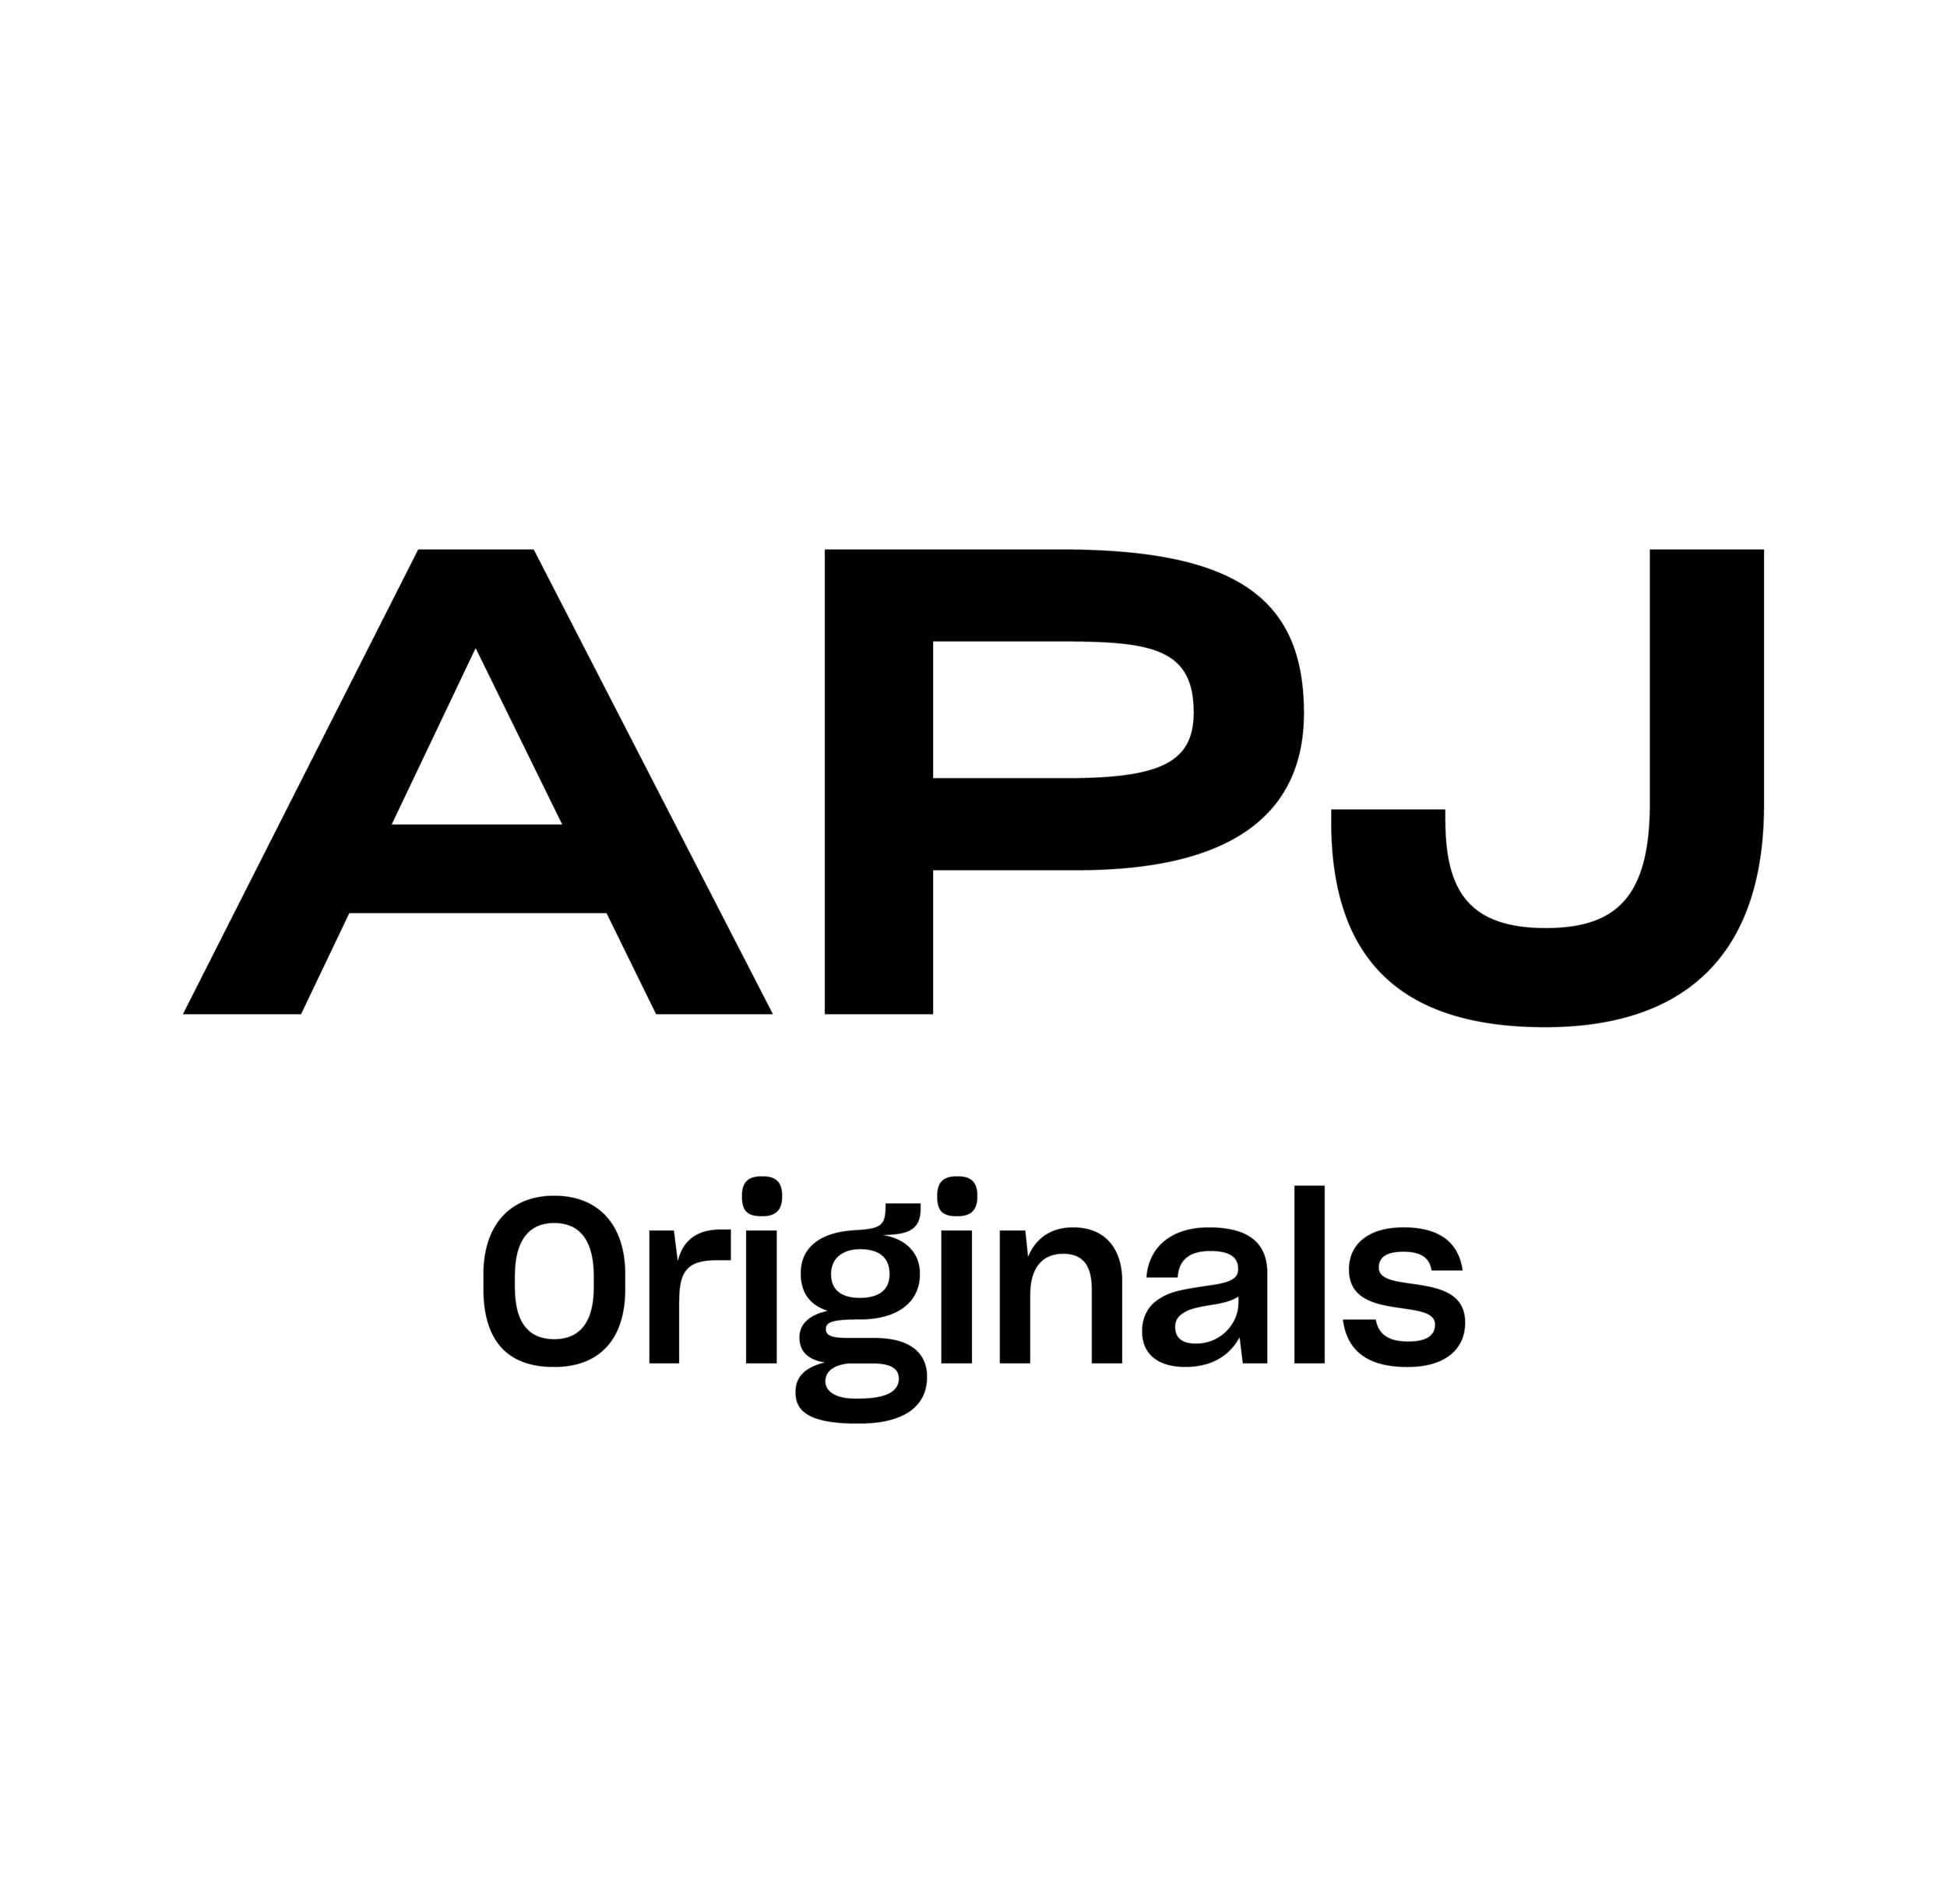 APJ_LogoLockup_Black copy 6.png